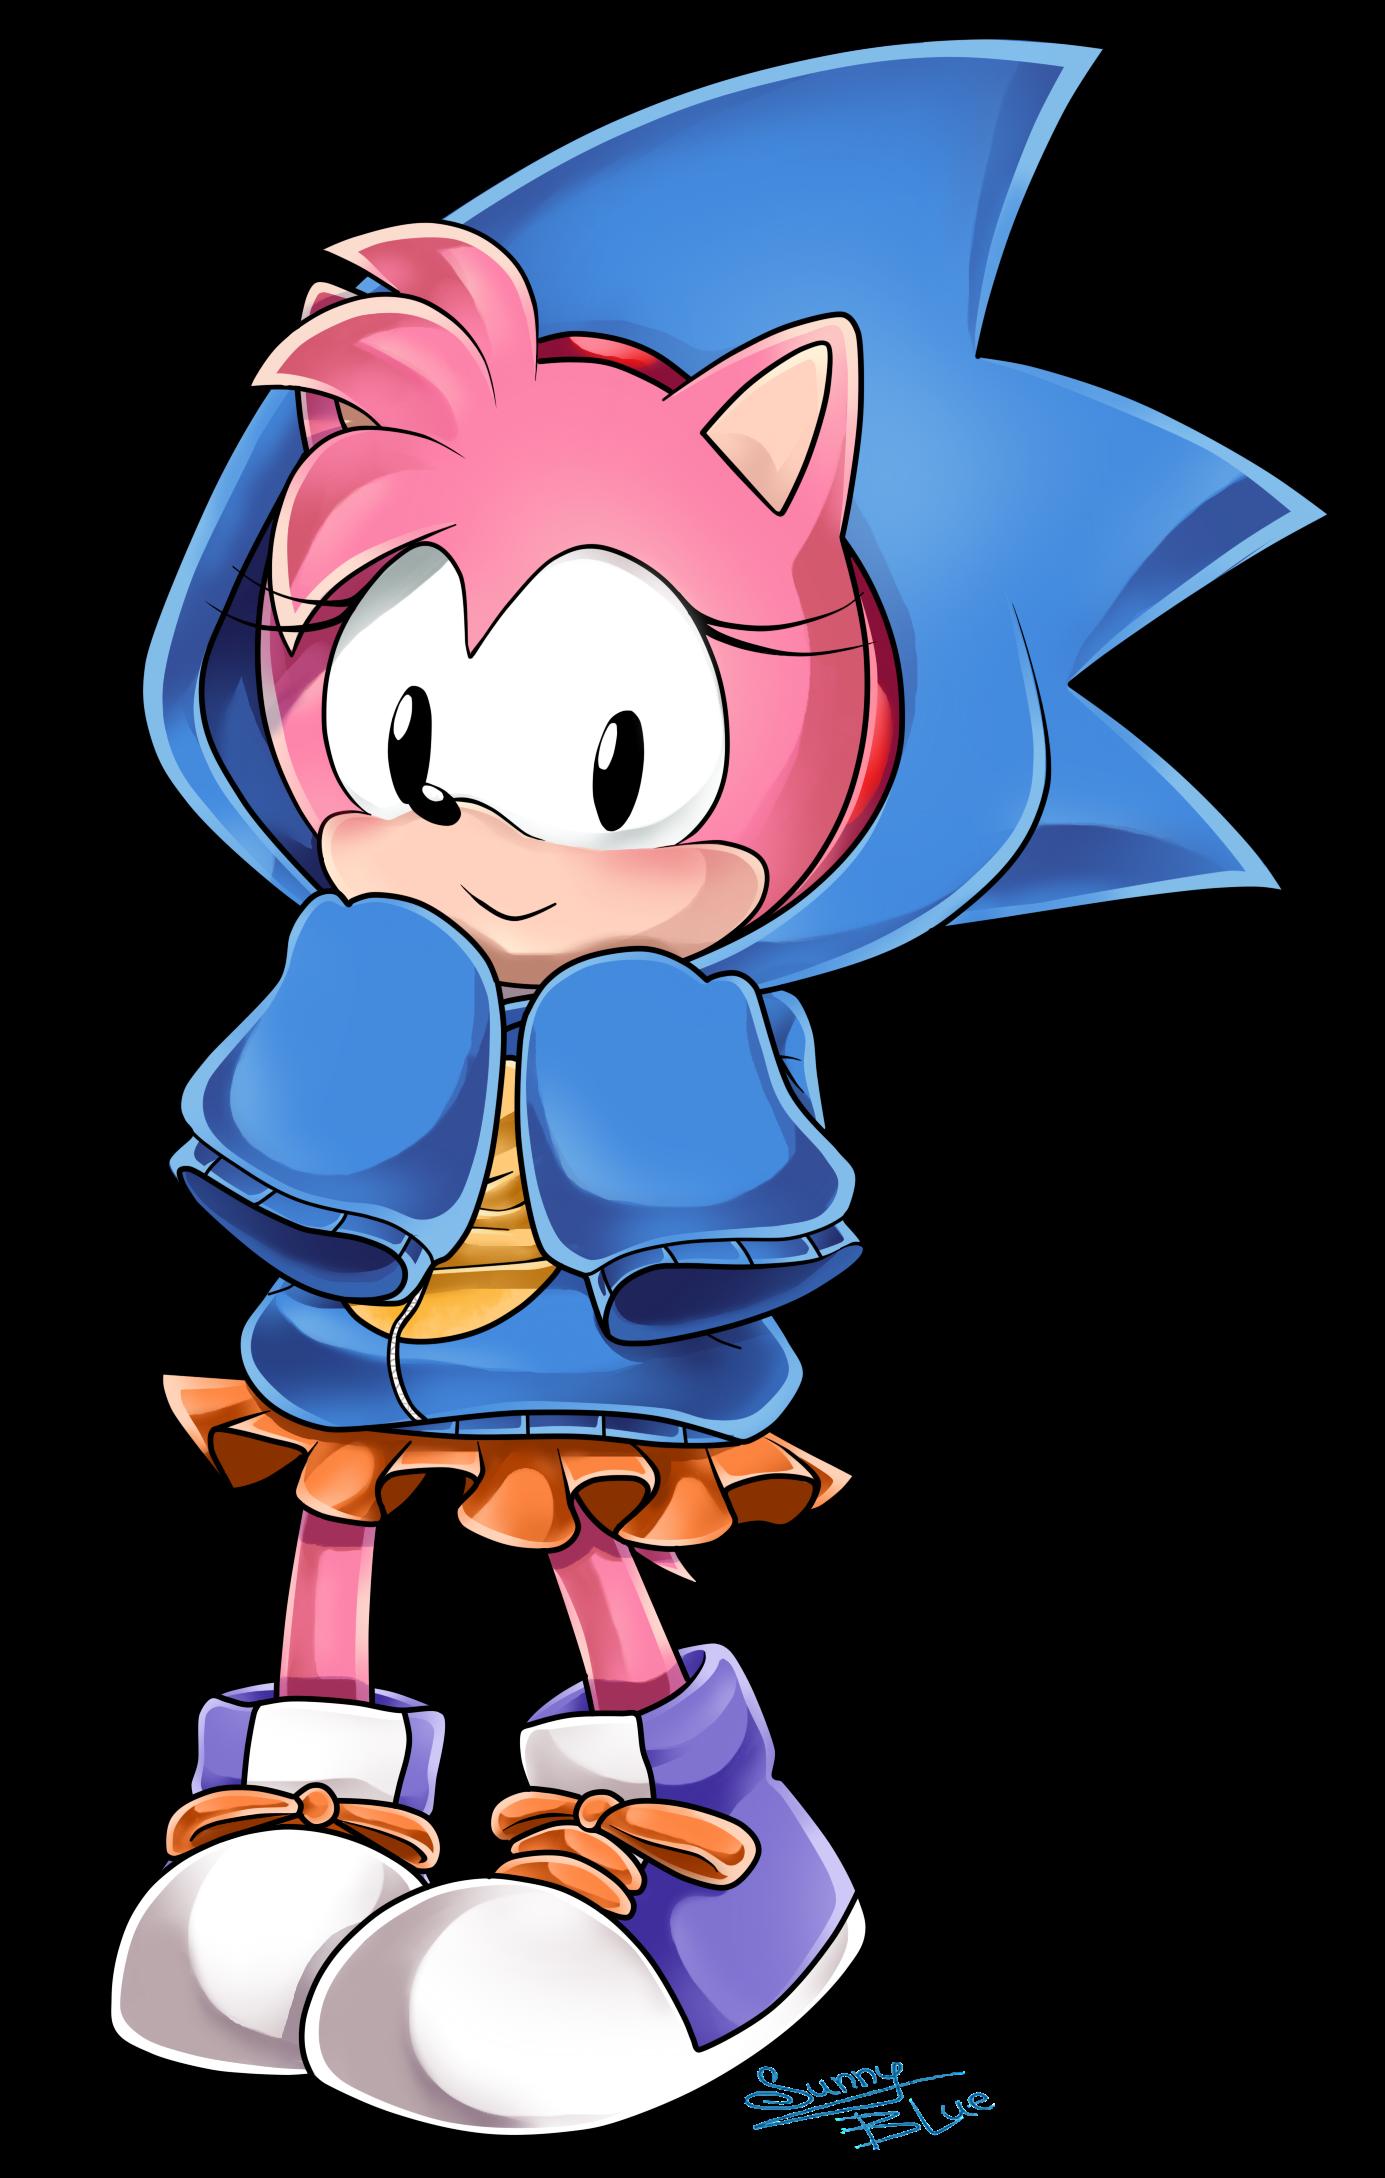 Classic Amy Wears Sonic Hoodie By Xxsunny Bluexx On Deviantart Sonic Classic Sonic Amy The Hedgehog